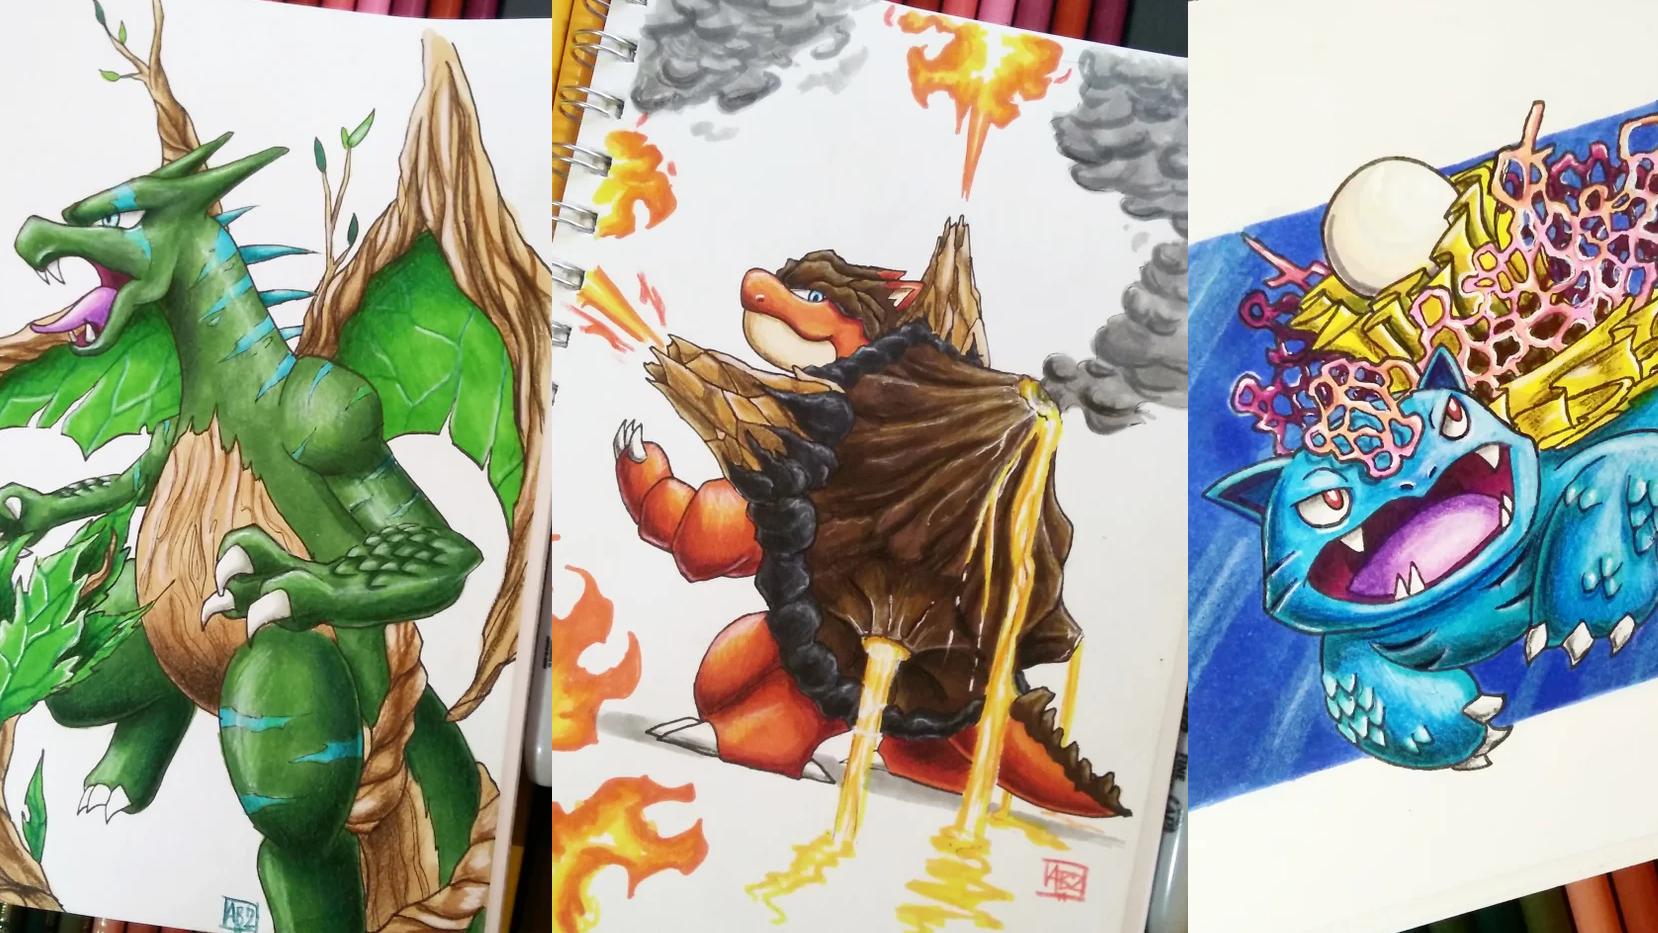 Artist Reimagines Pokémon Starters As Different Pokémon Types